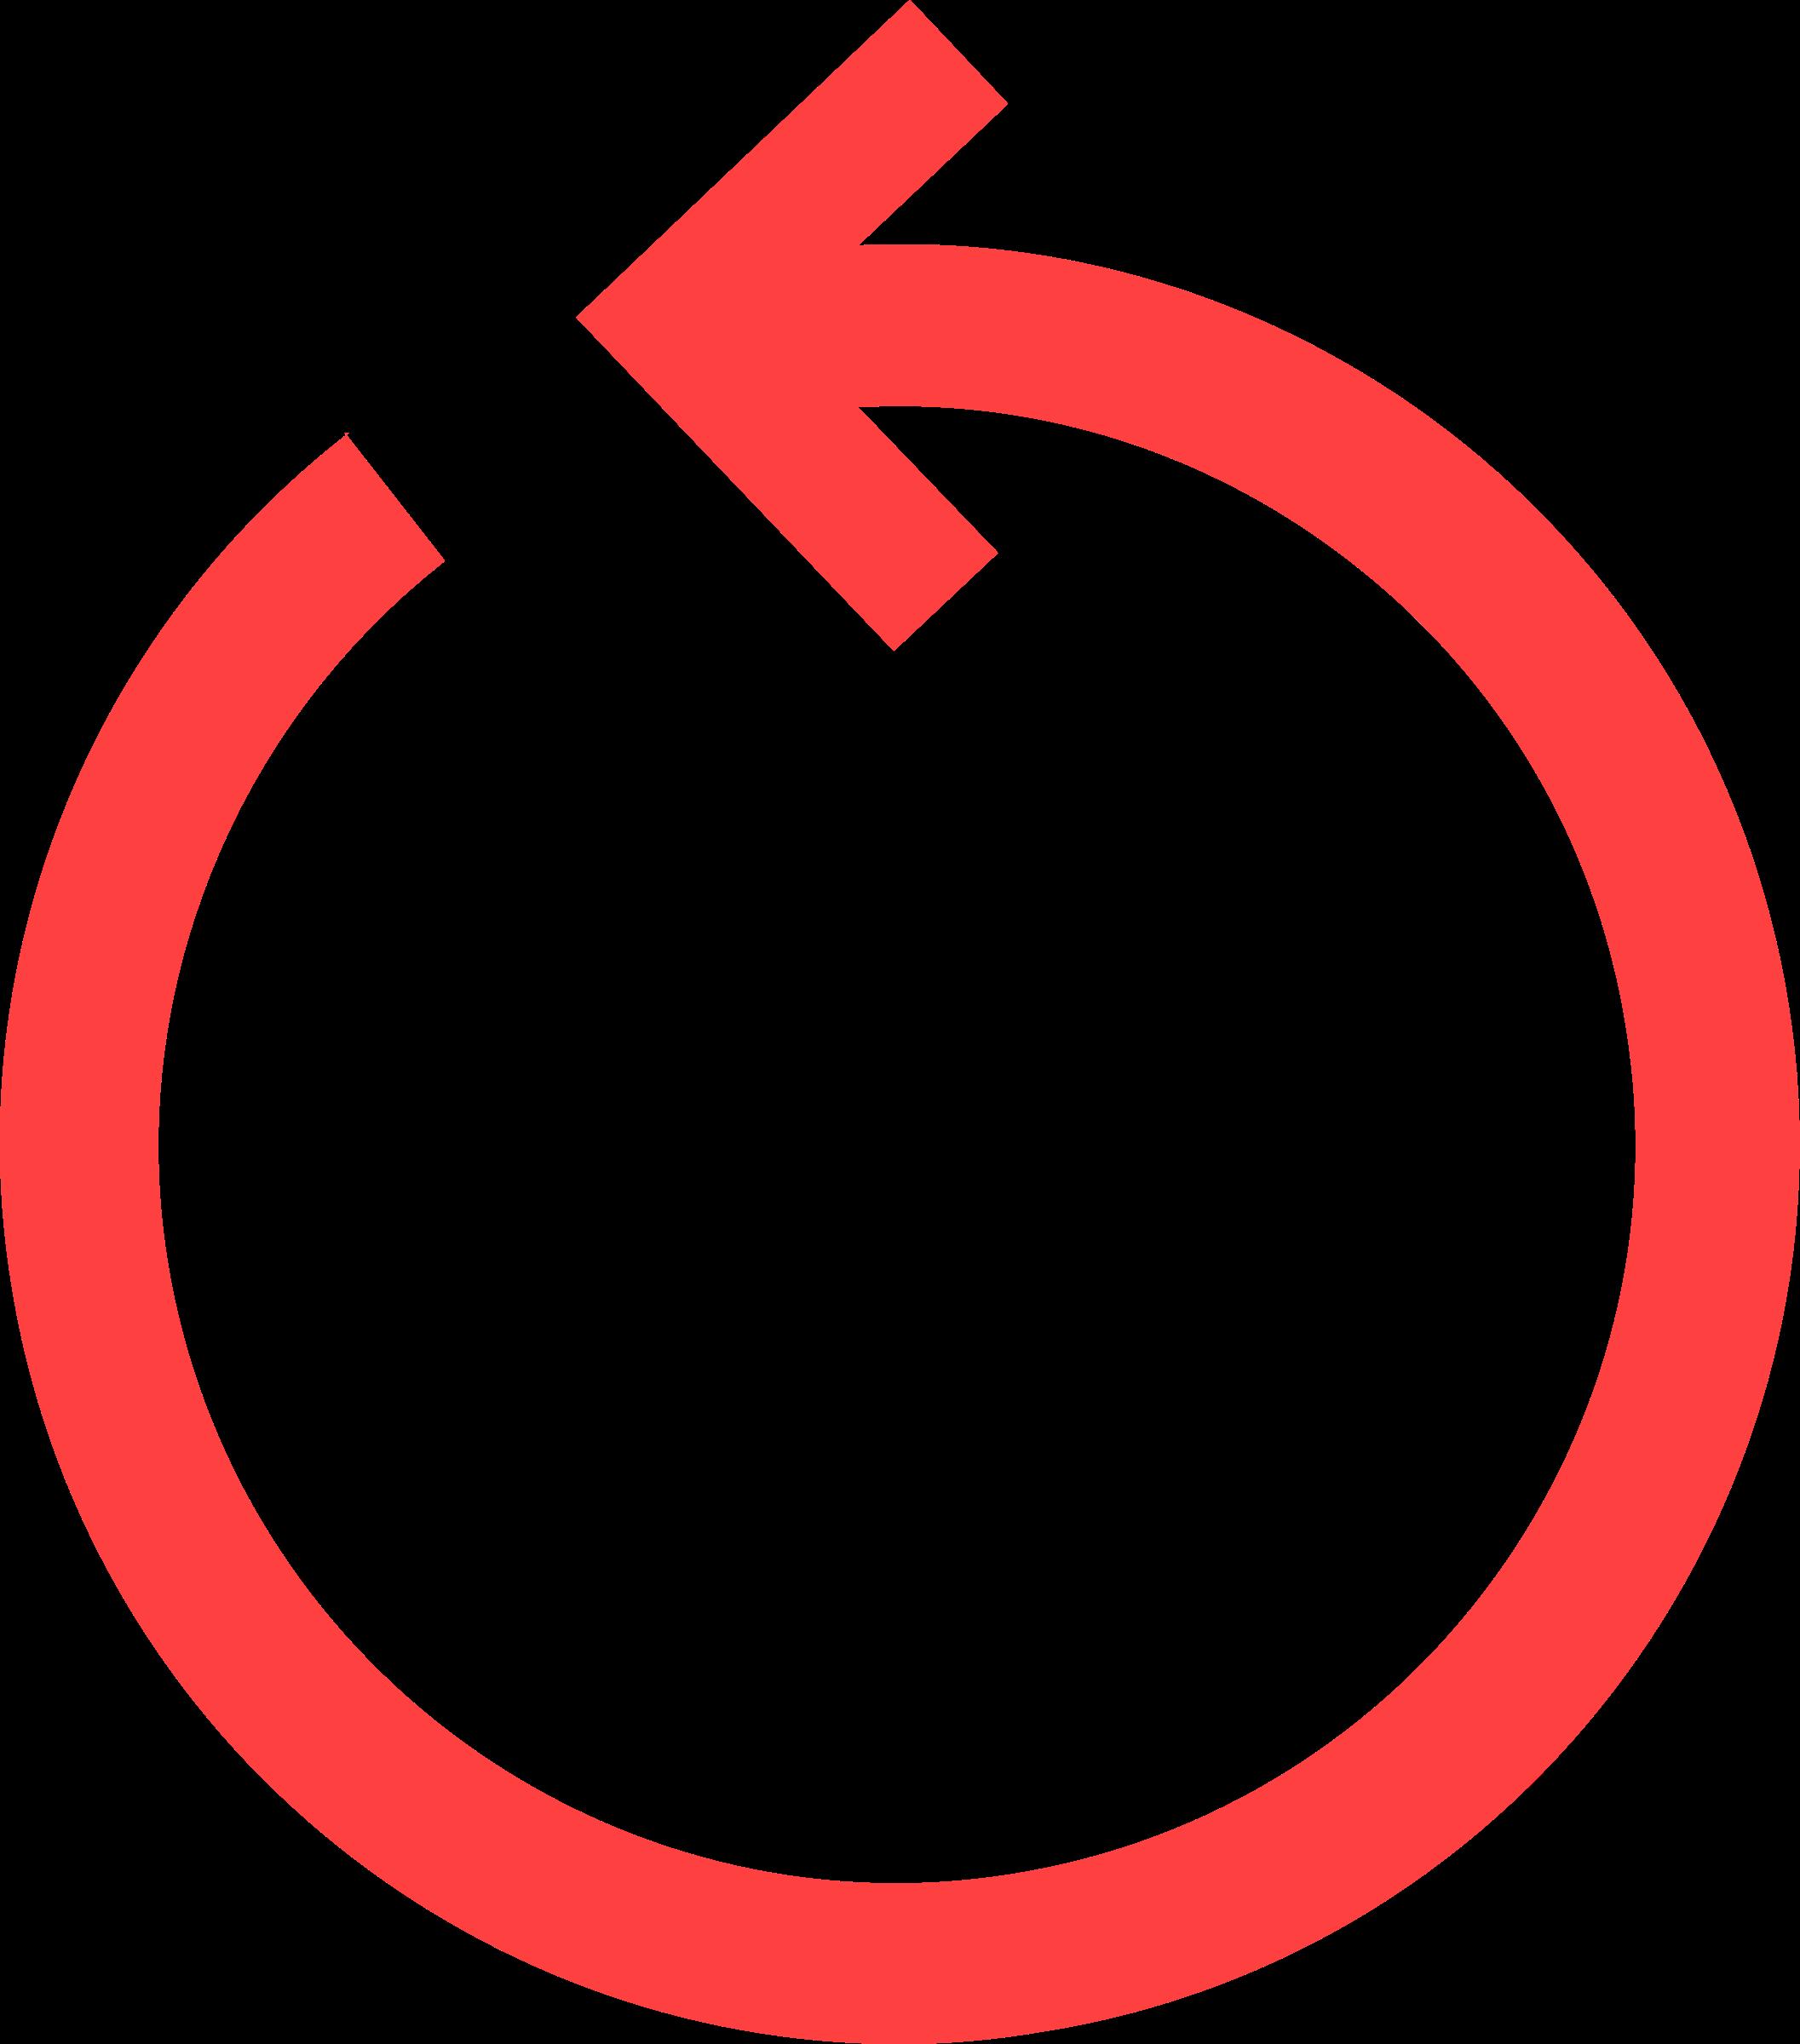 Clipart arrows filigree. Circular arrow red big